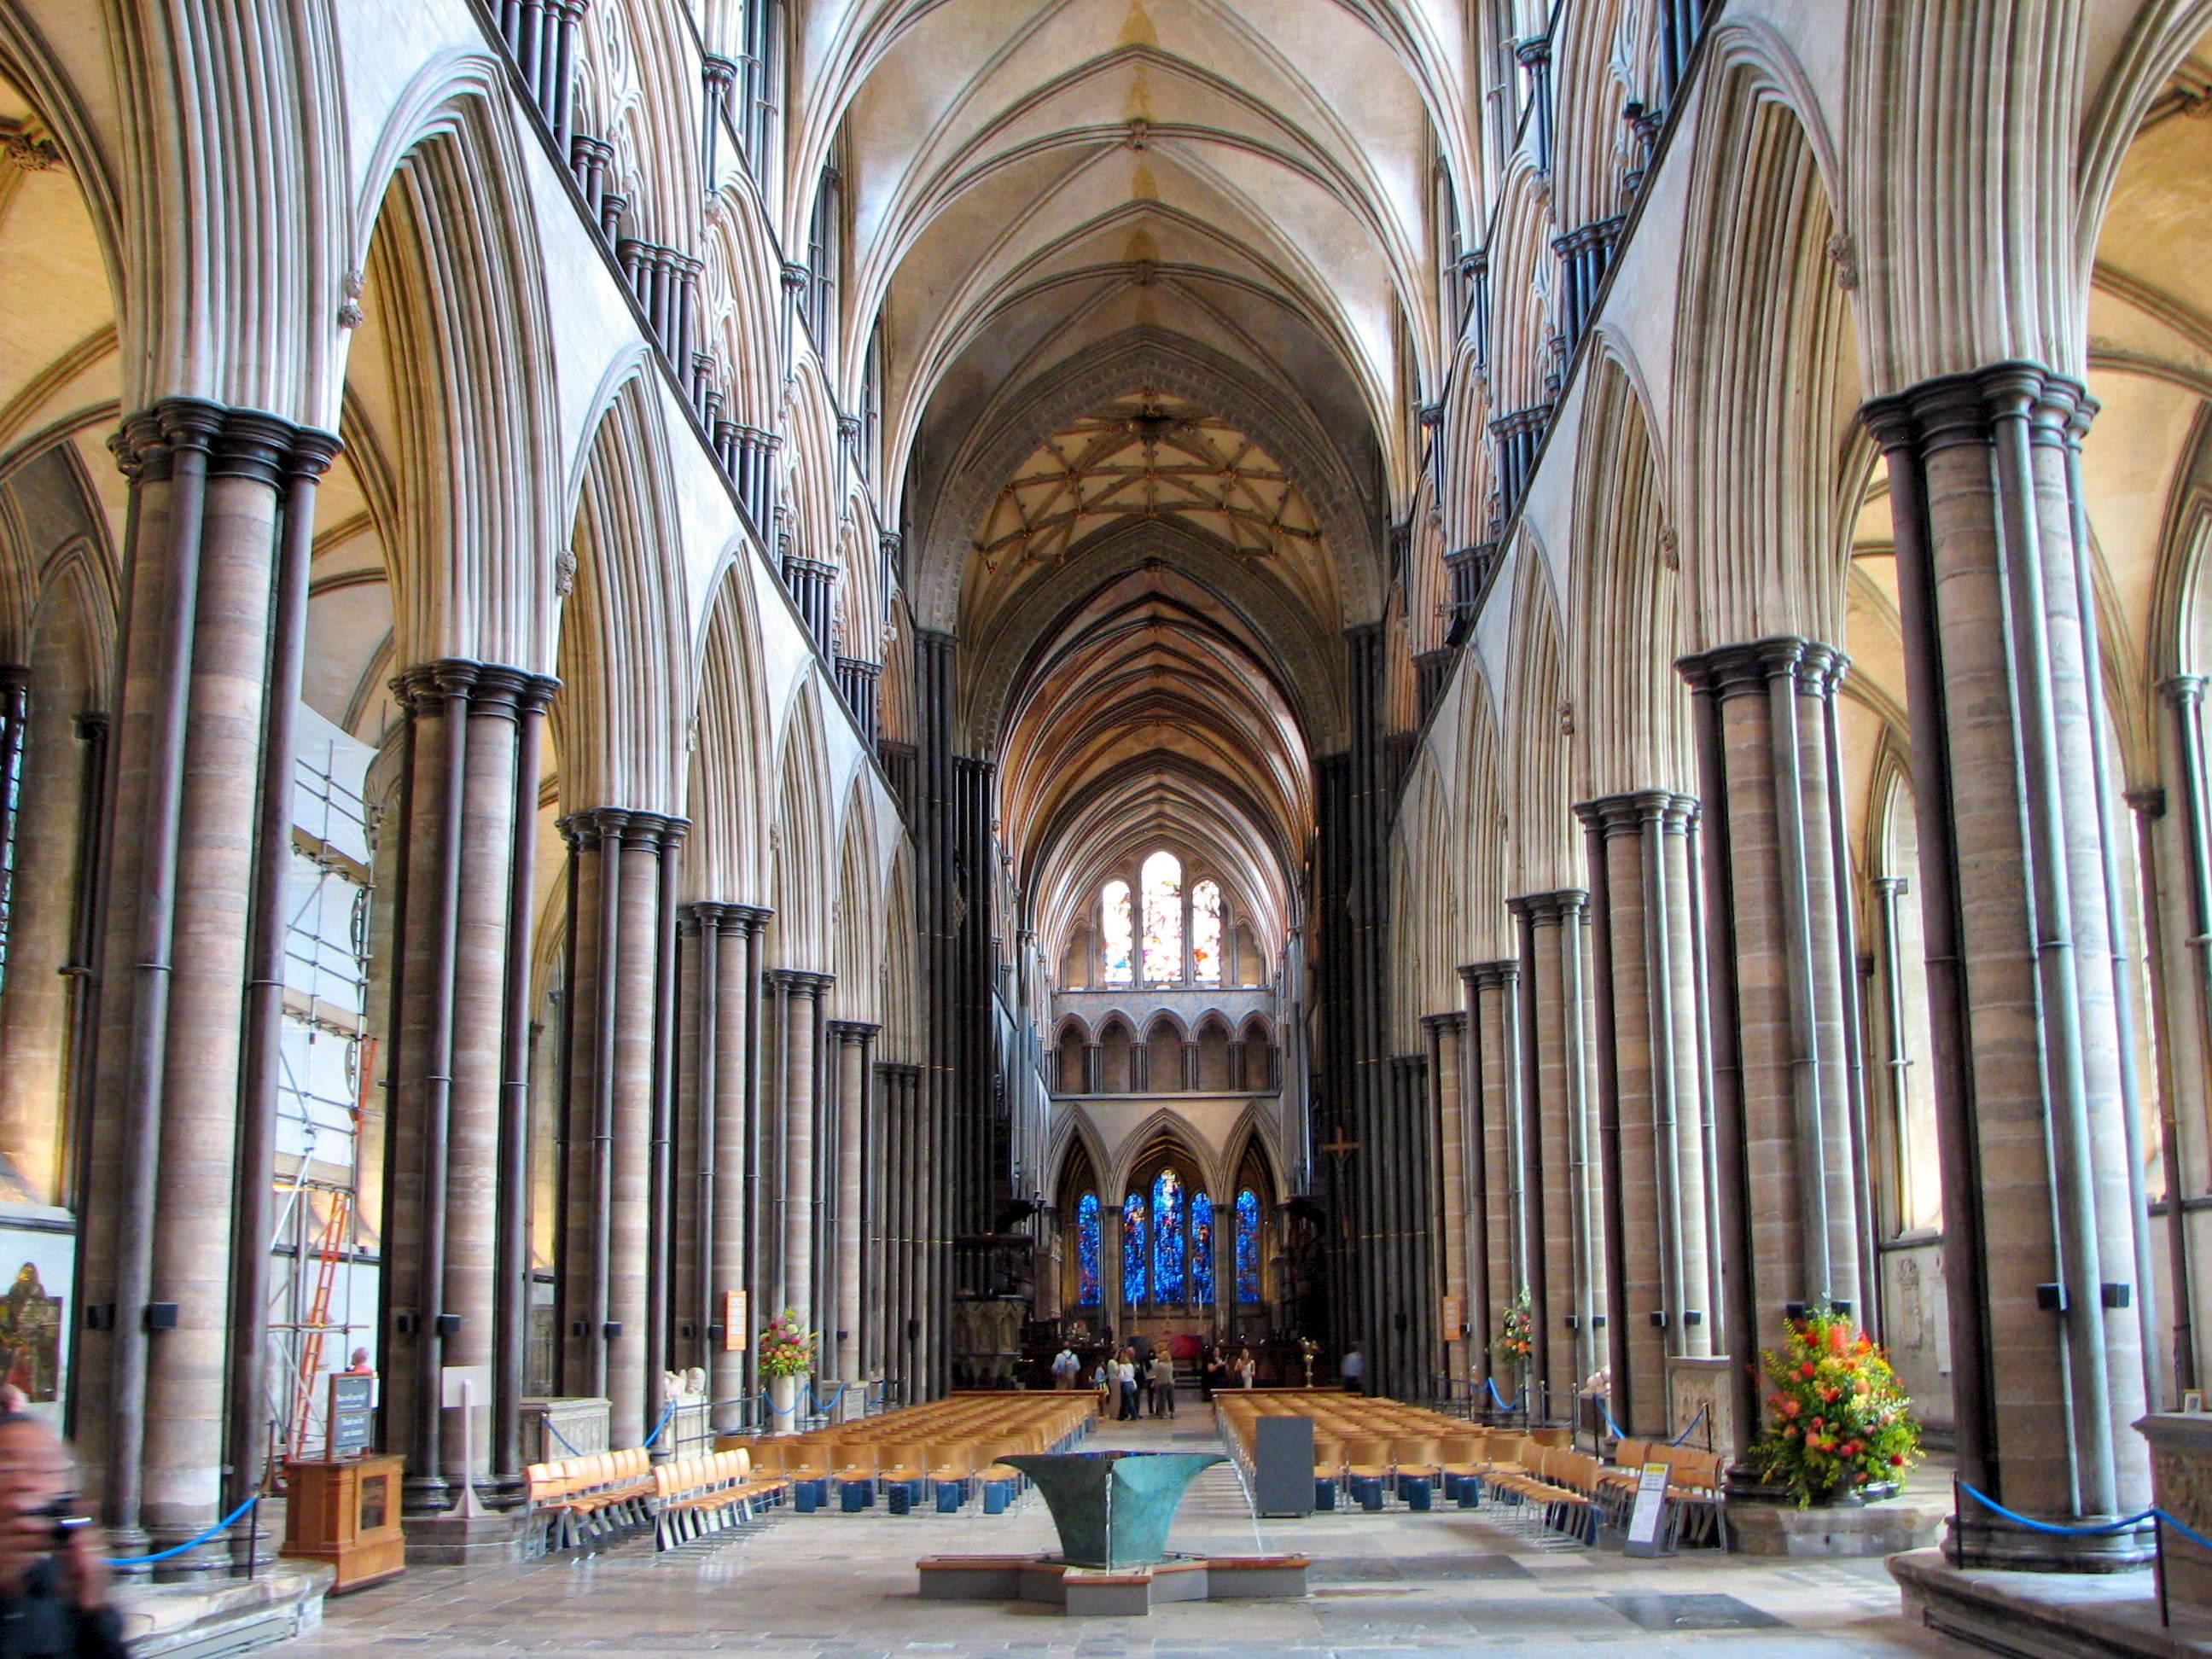 salisbury cathedral - photo #17